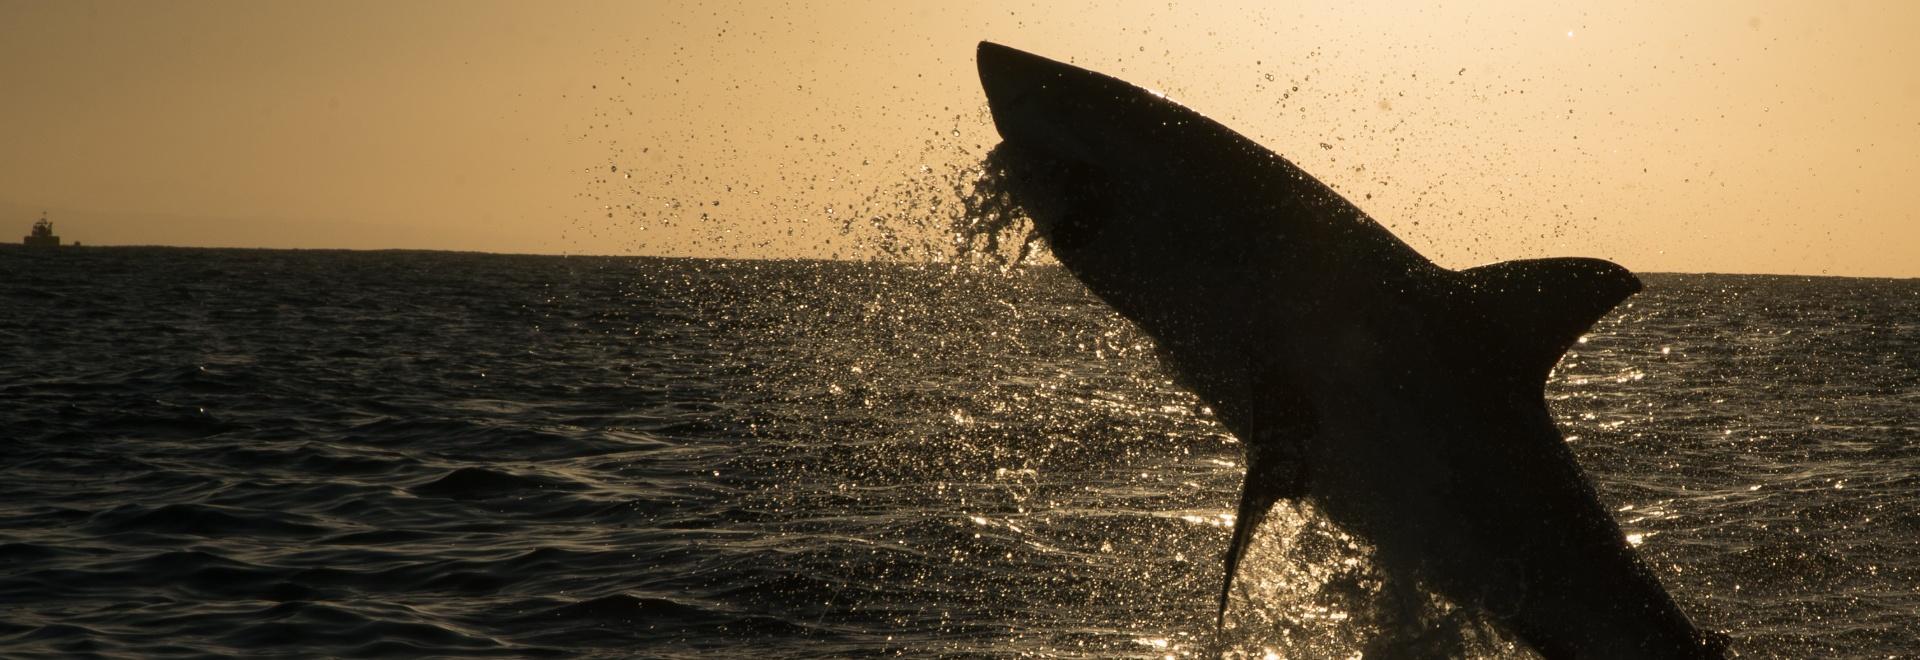 La legge degli squali